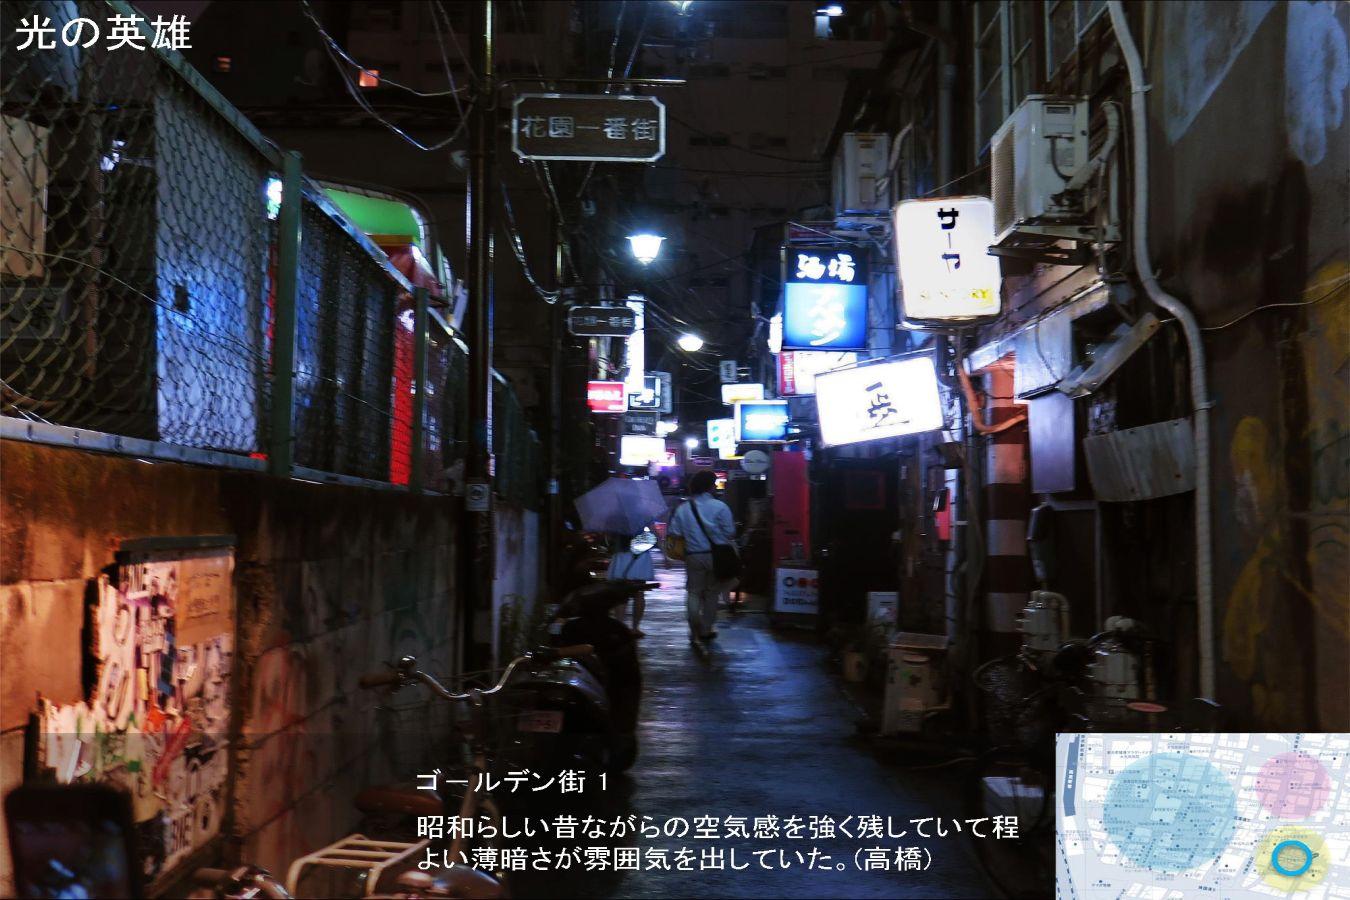 150623_4班_歌舞伎町街歩き 5